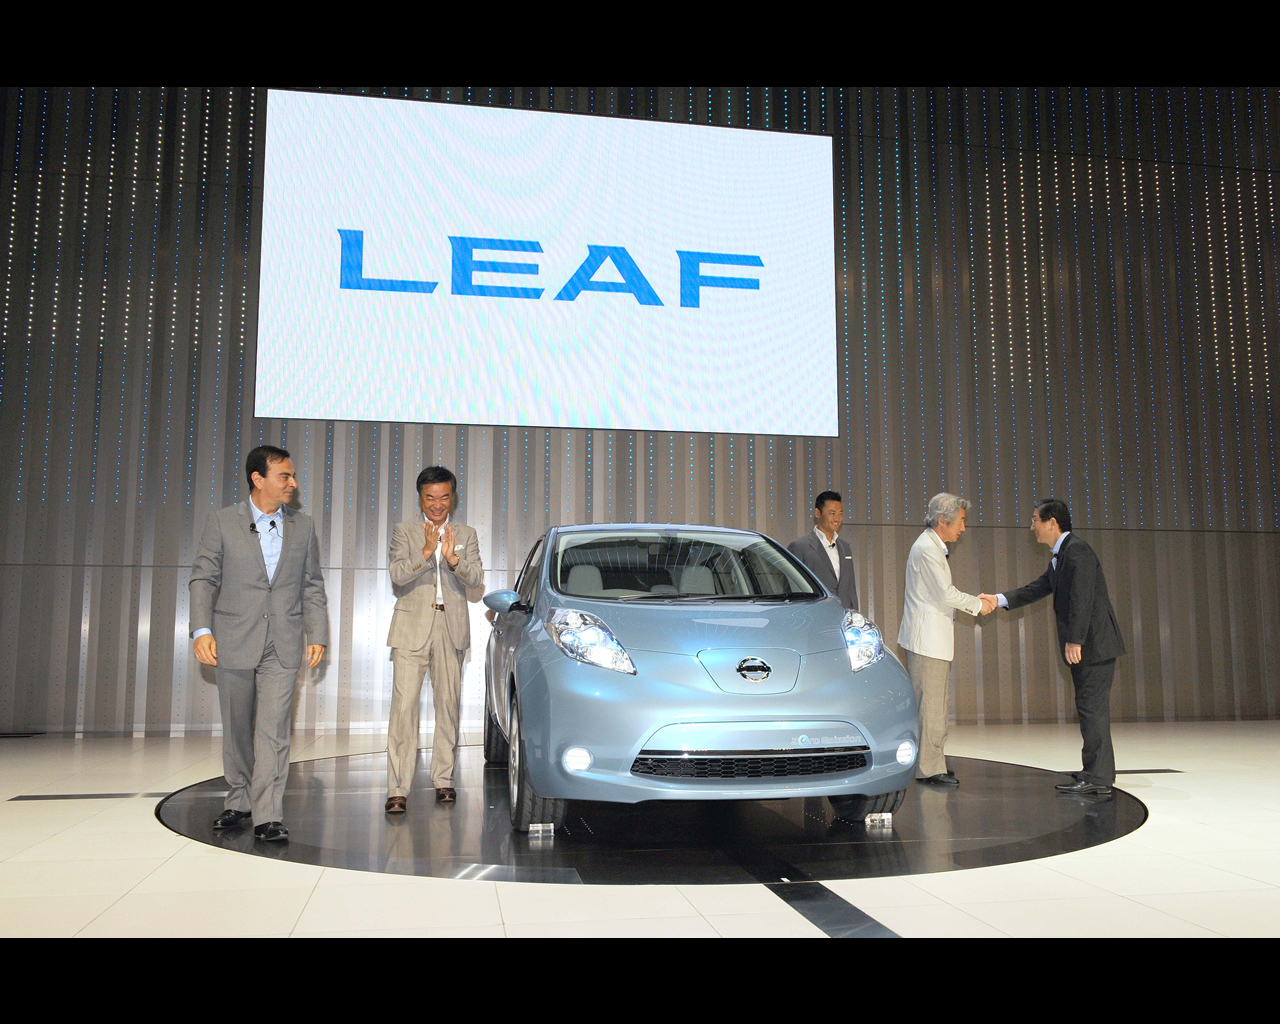 Leaf electric prototype 2009 nissan leaf electric prototype 2009 vanachro Gallery